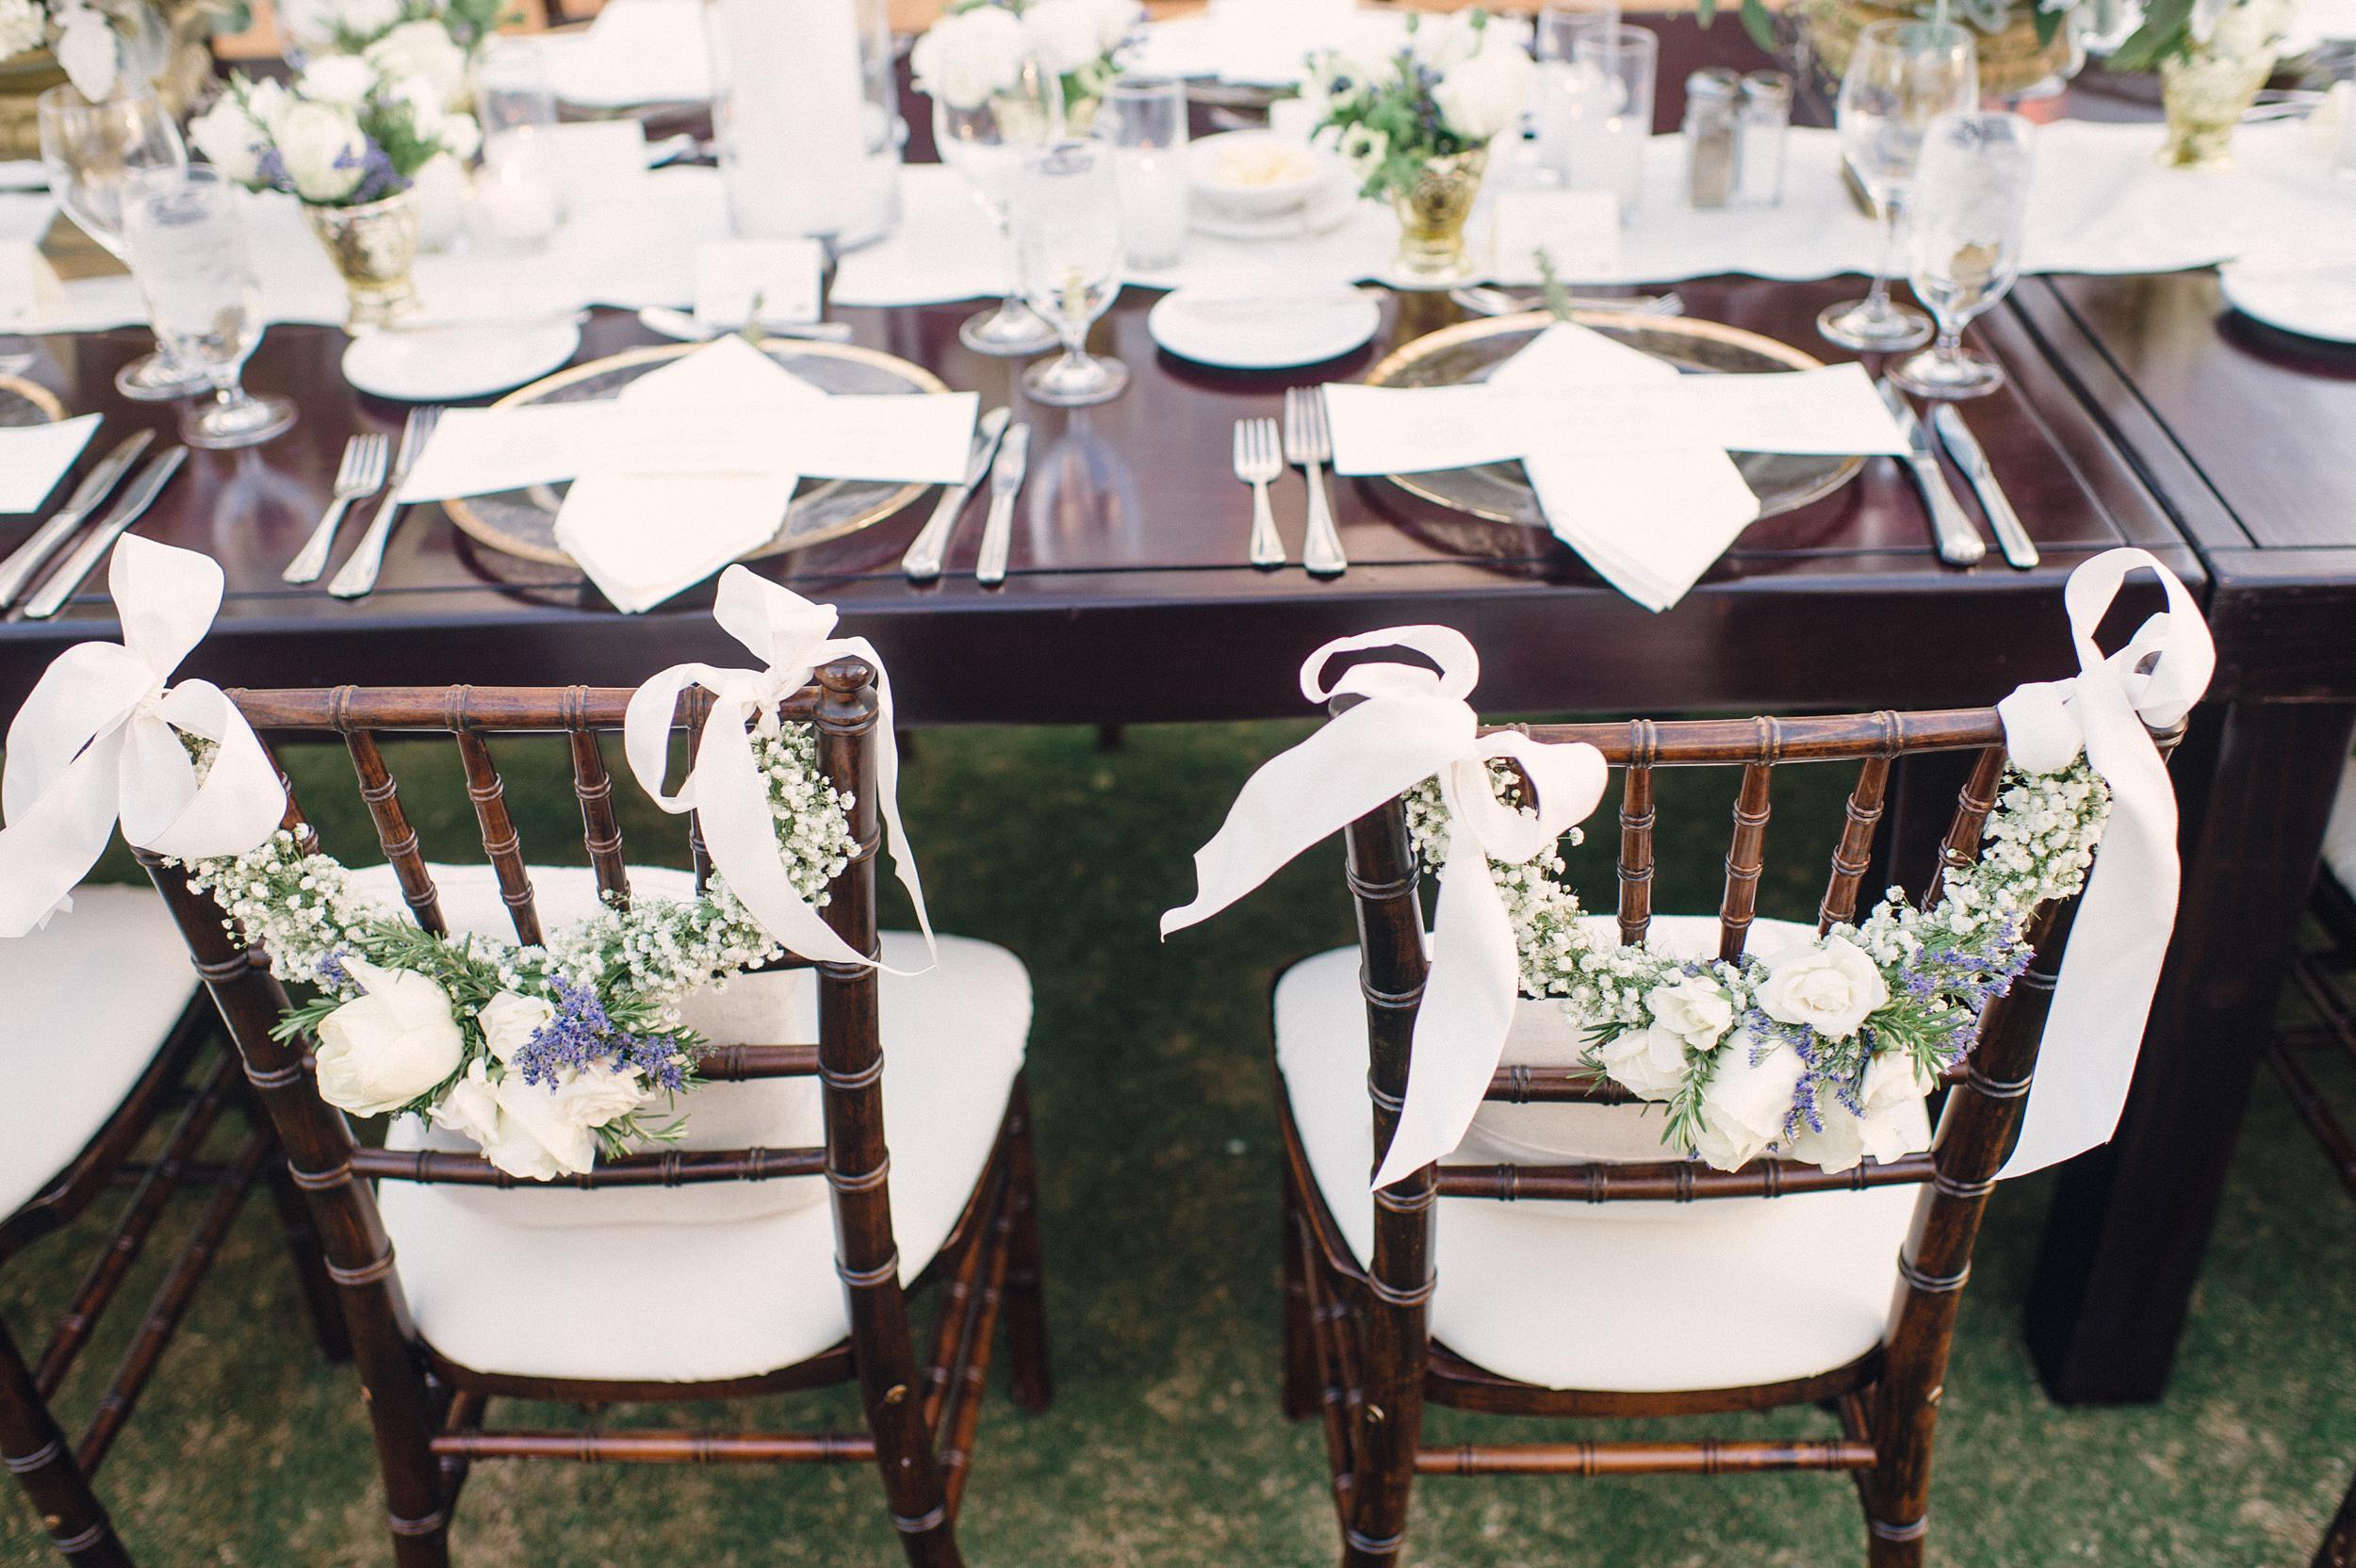 annandale-golf-club-pasadena-wedding-JM-12.jpg